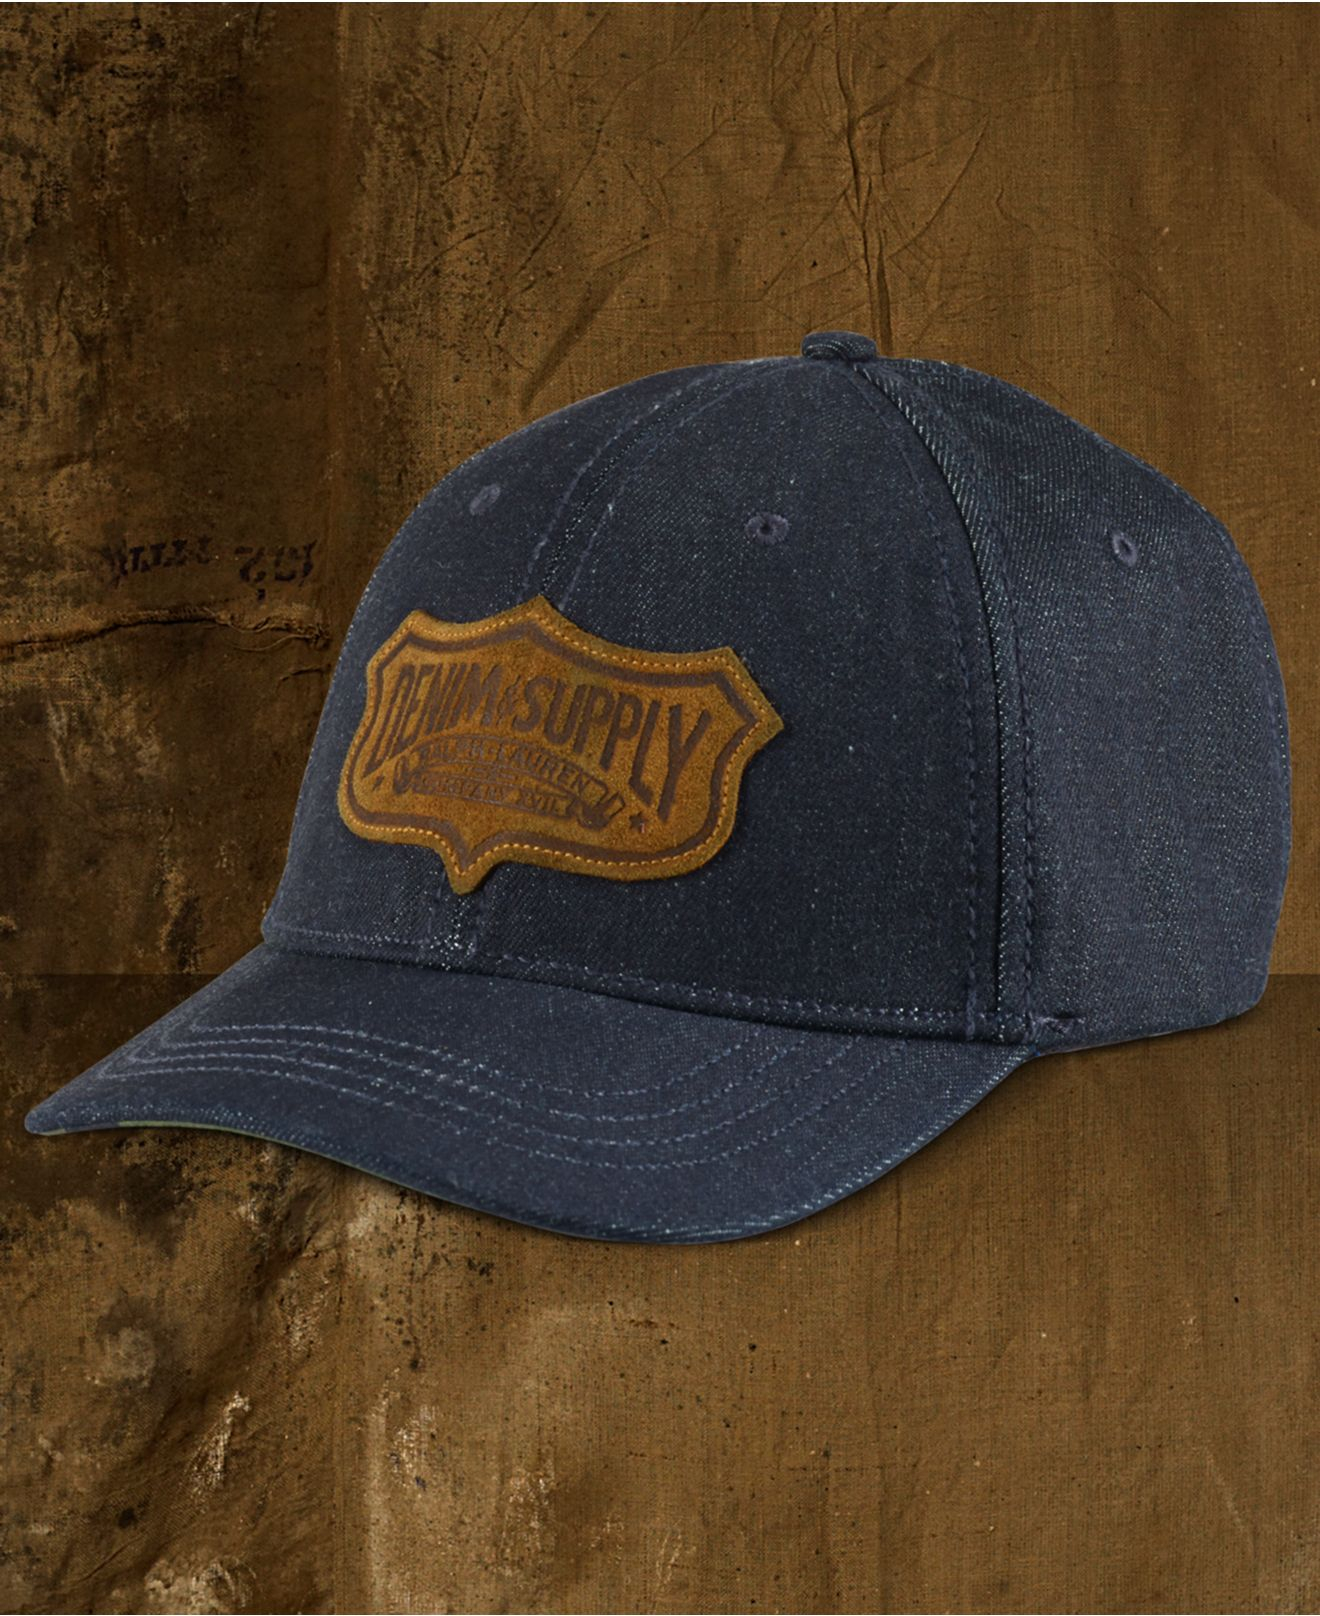 43821d21237 Lyst - Denim   Supply Ralph Lauren Men s Denim Baseball Cap in Blue ...